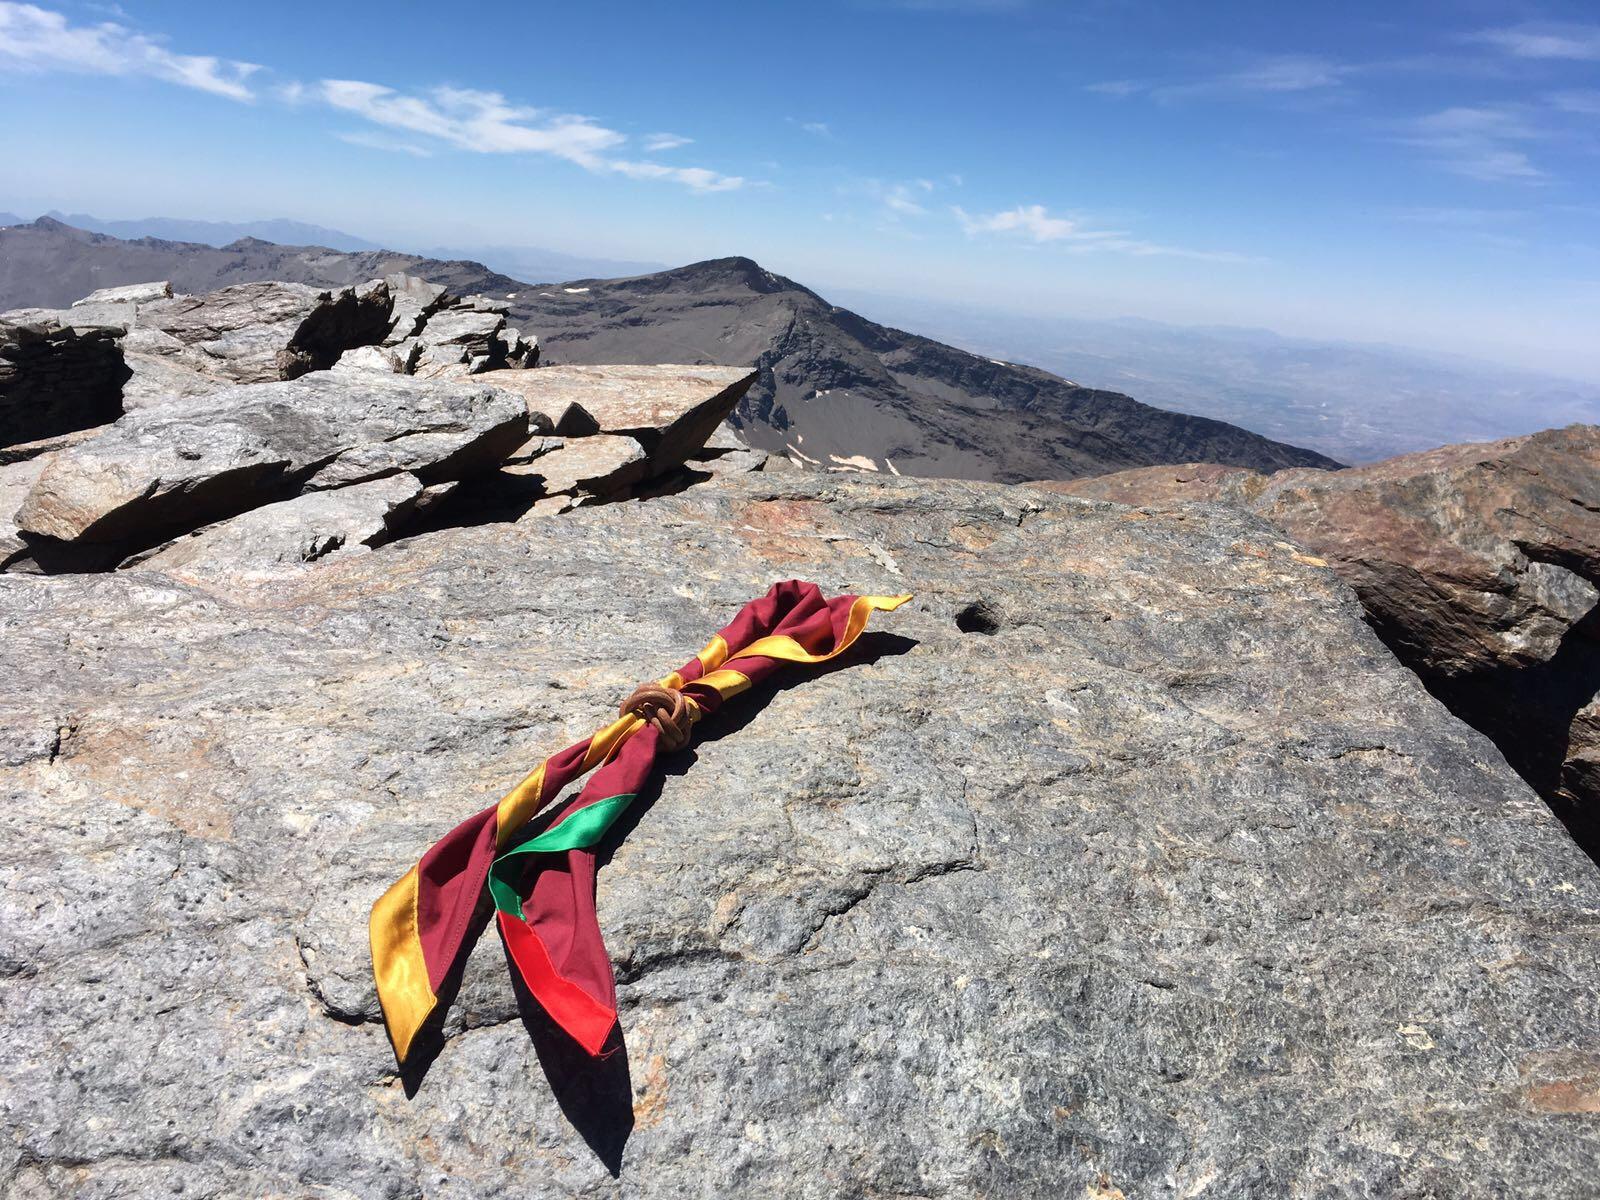 Mulhacén (Sierra Nevada, Granada) Junio 2017 - Scouts Magma